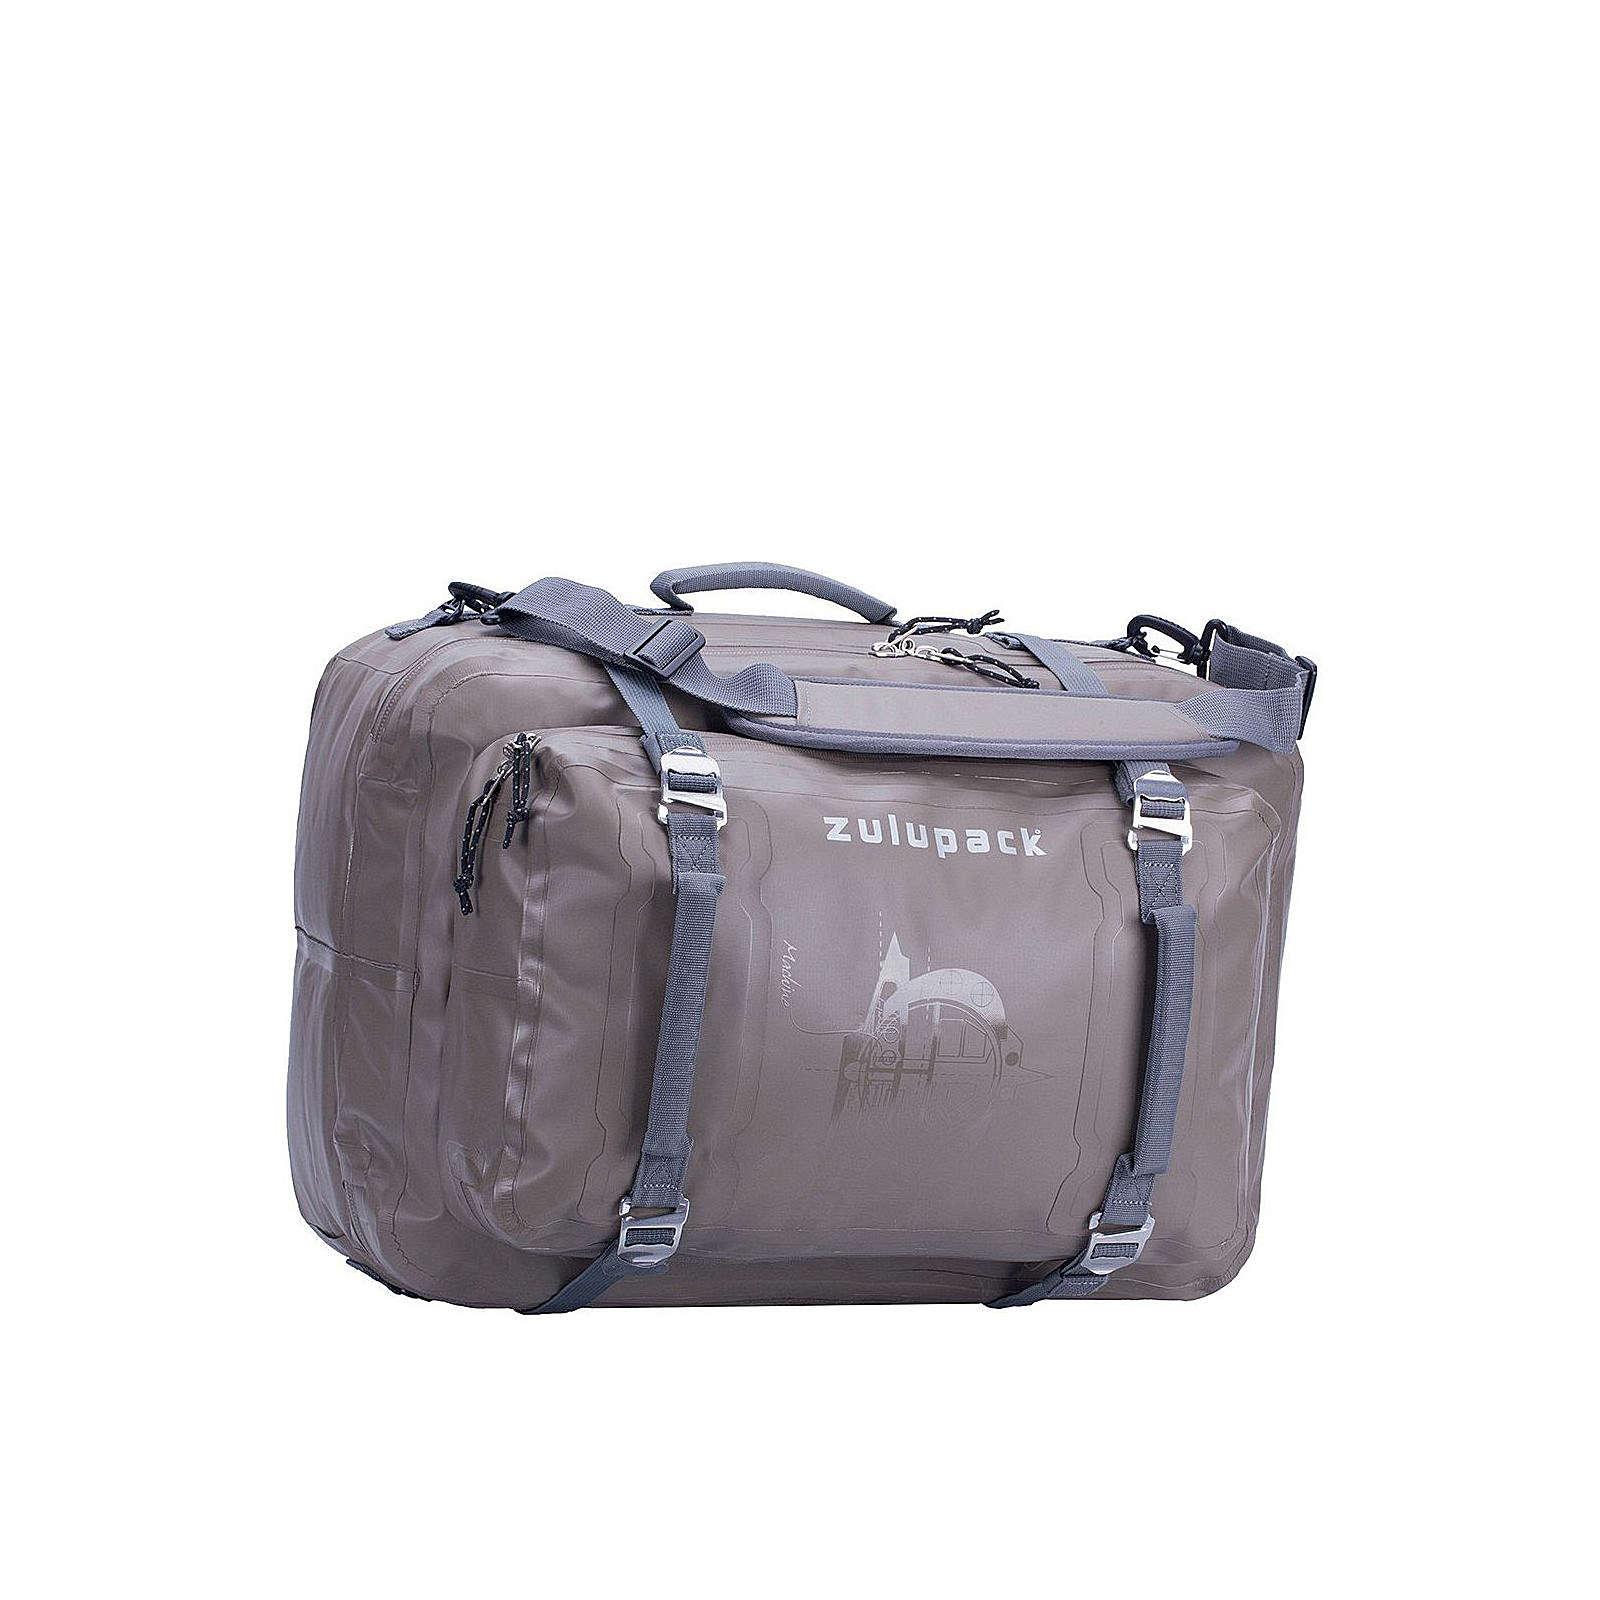 Zulupack Antipode Rucksack-Tasche  45 L waterressistant 55 cm Trolleys grau